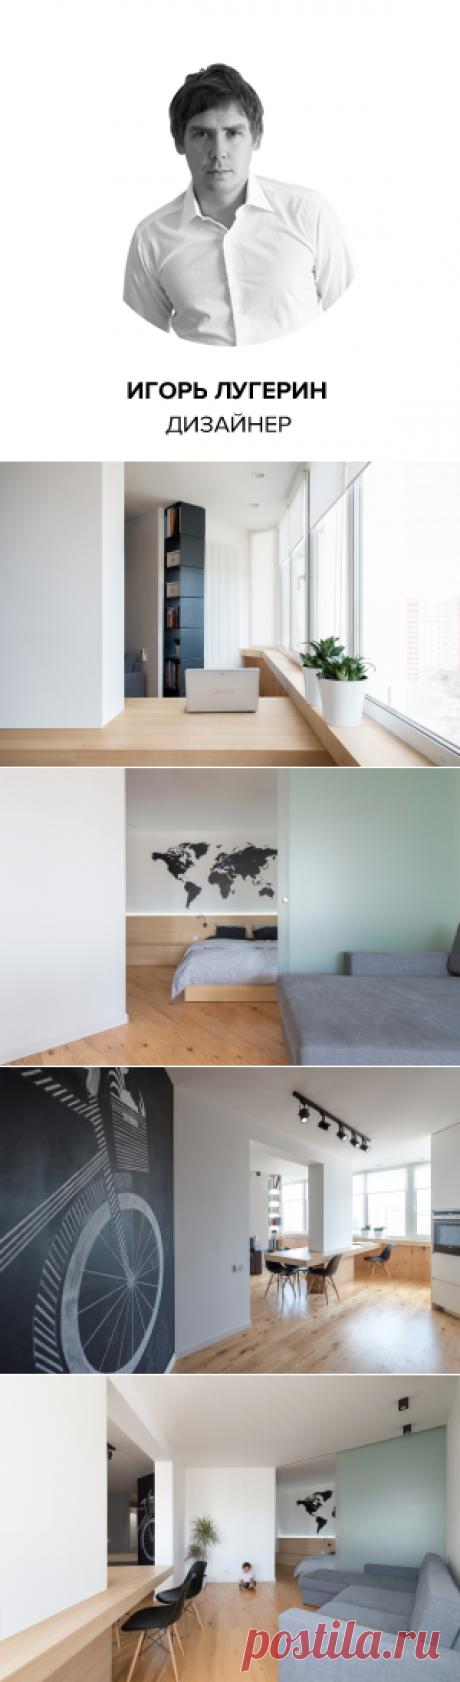 Studio of week: the apartment in style minimalism in Kiev | Fresh ideas of interior design, decor, architecture on InMyRoom.ru